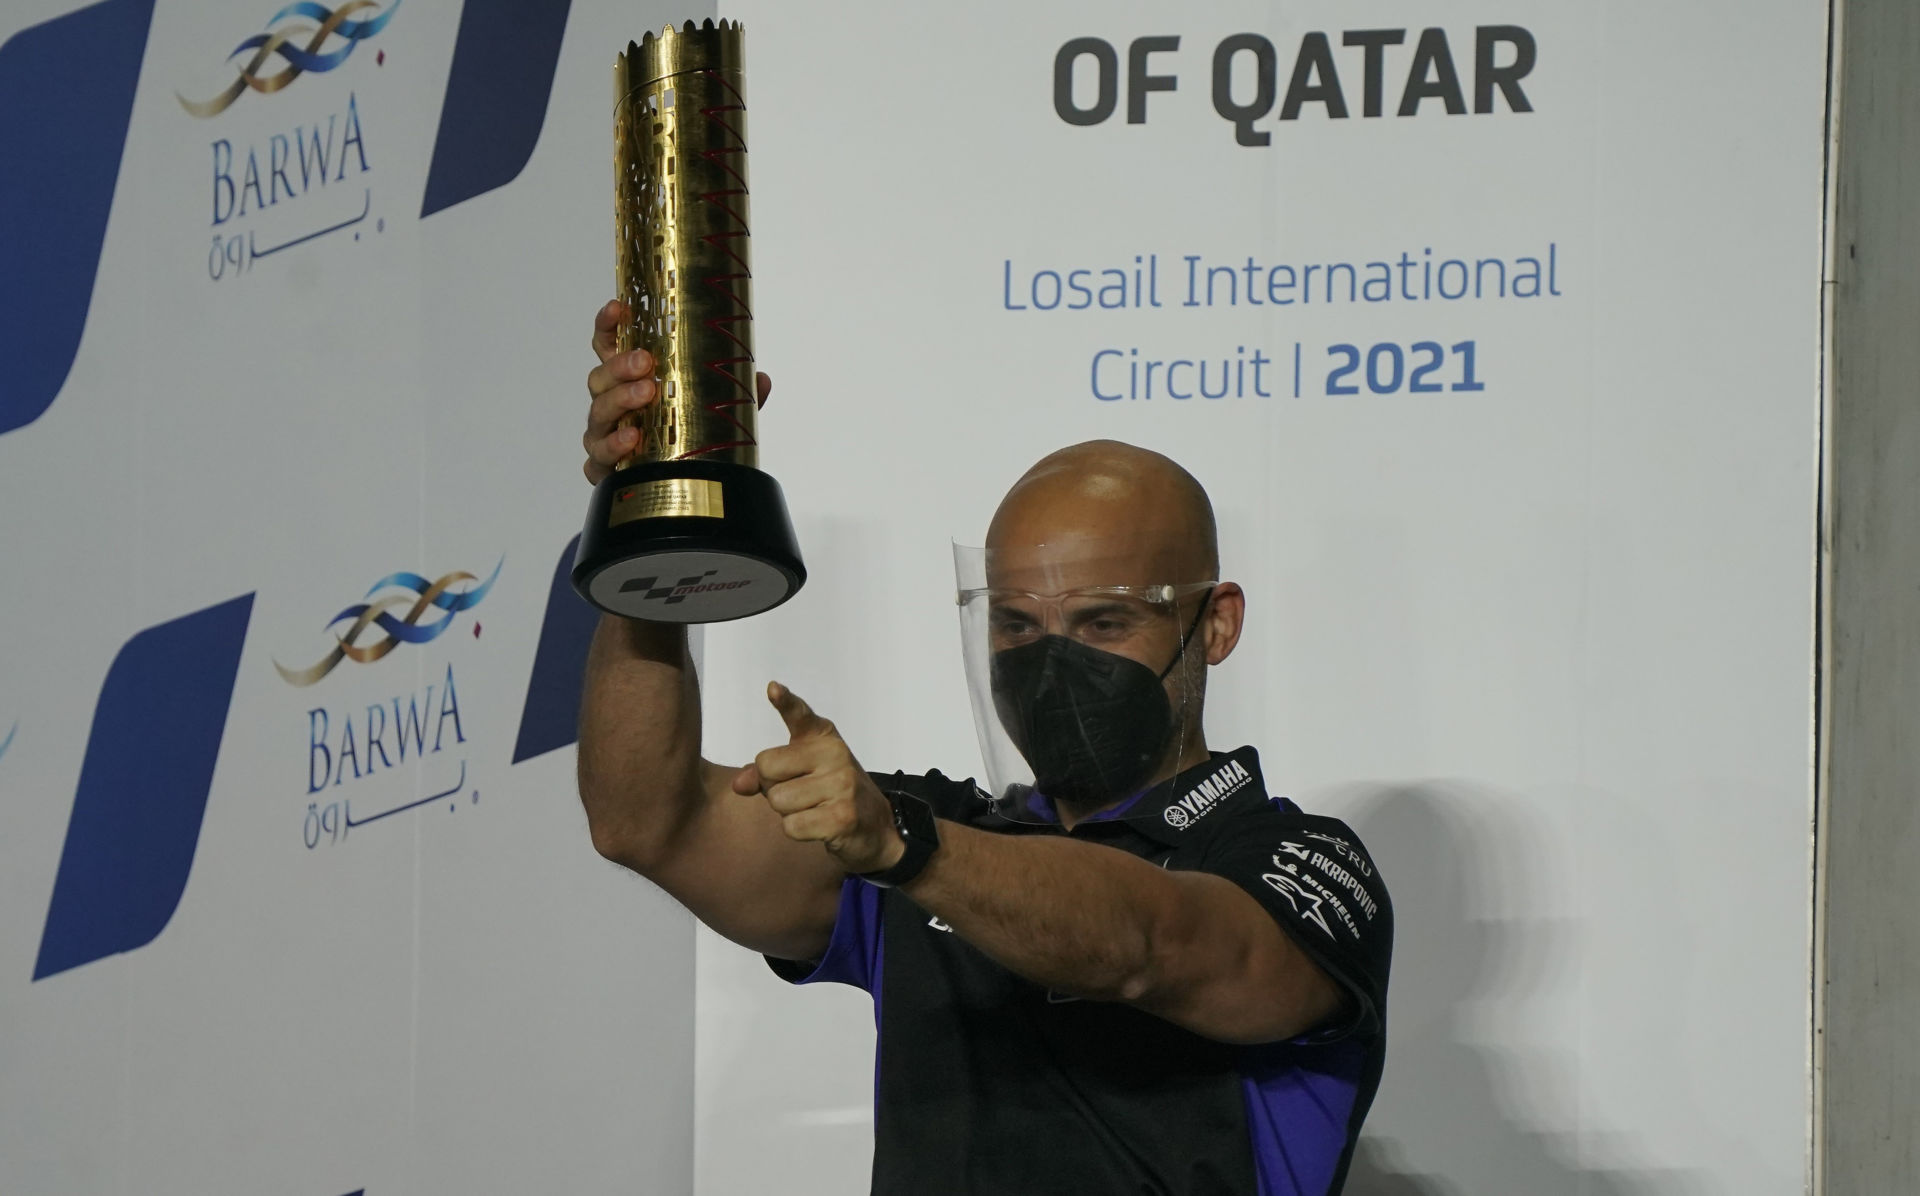 Esteban García Amoedo on the MotoGP podium, after Maverick Vinales won the opening race of the 2021 season in Qatar. Photo courtesy Monster Energy Yamaha.